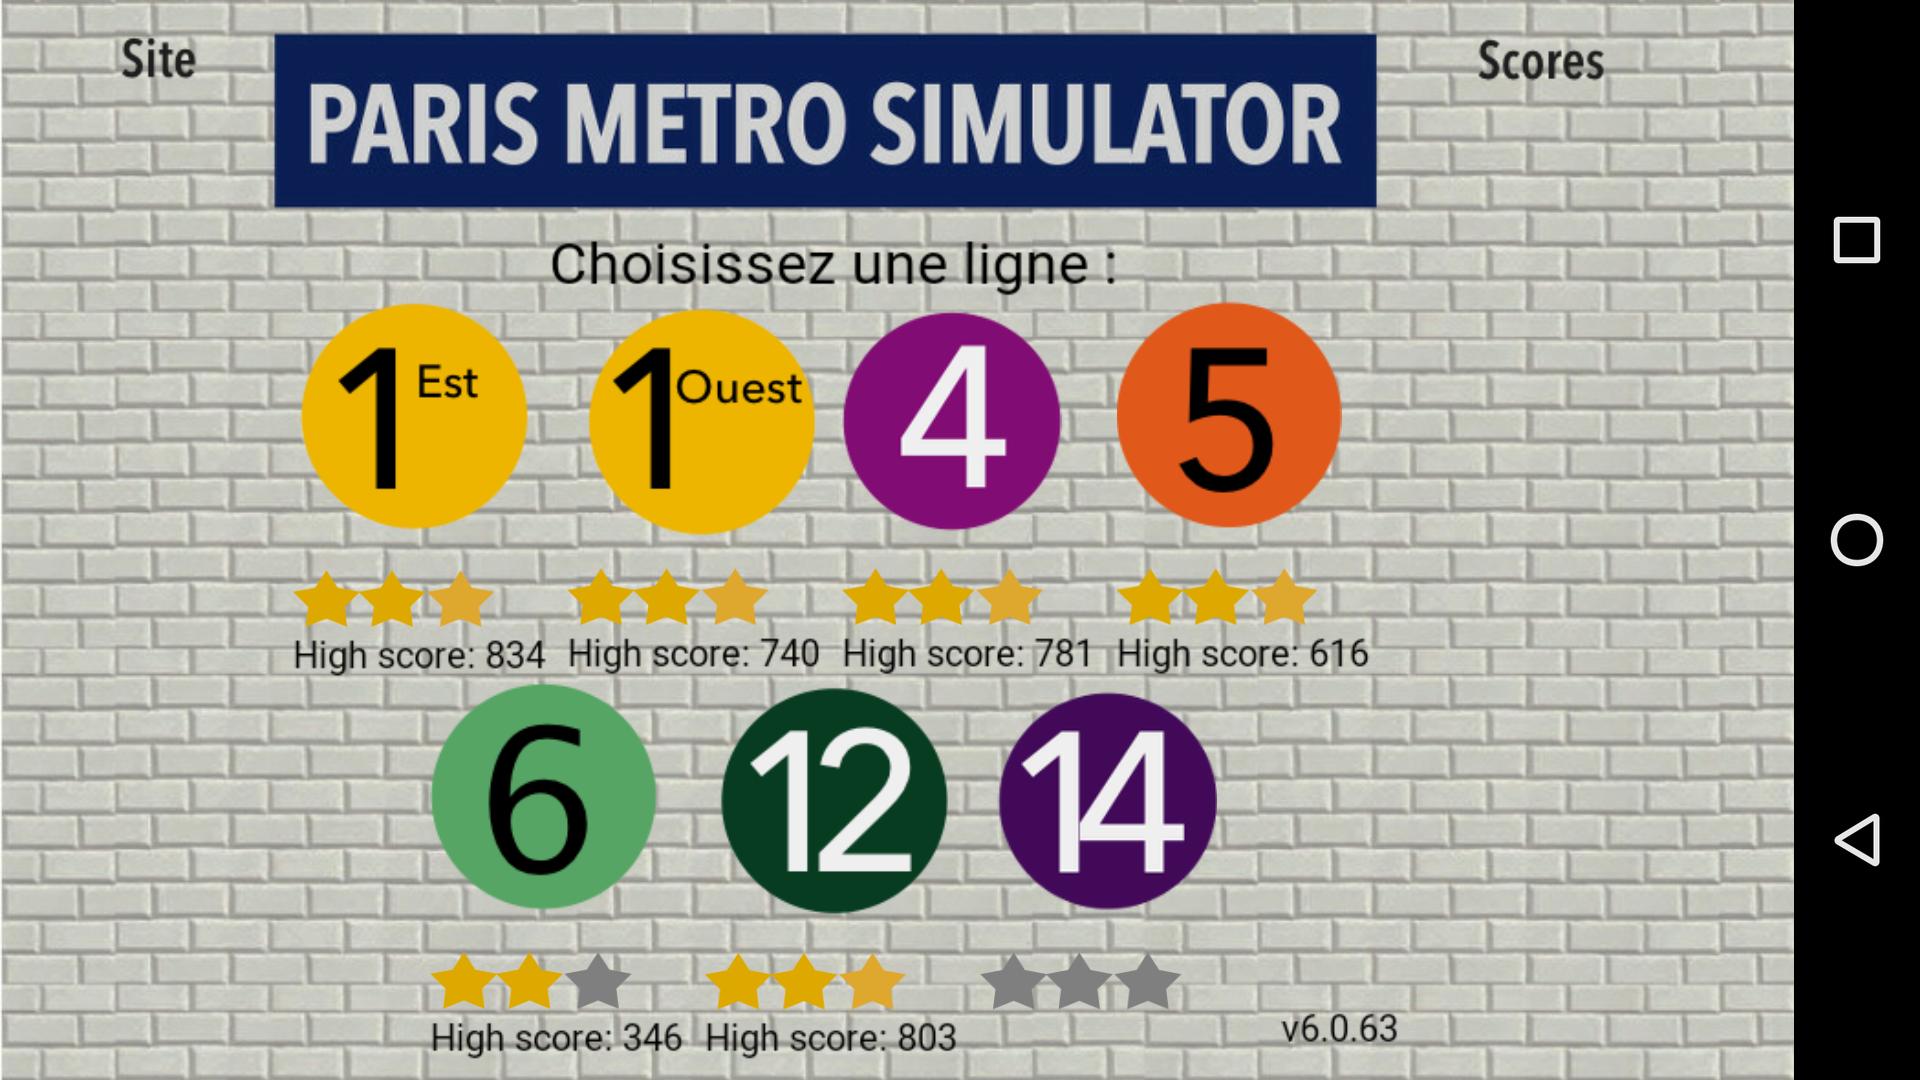 Mantalow: Paris Metro Simulator [Line 6] (Android) 346 points on 2015-12-11 02:09:52